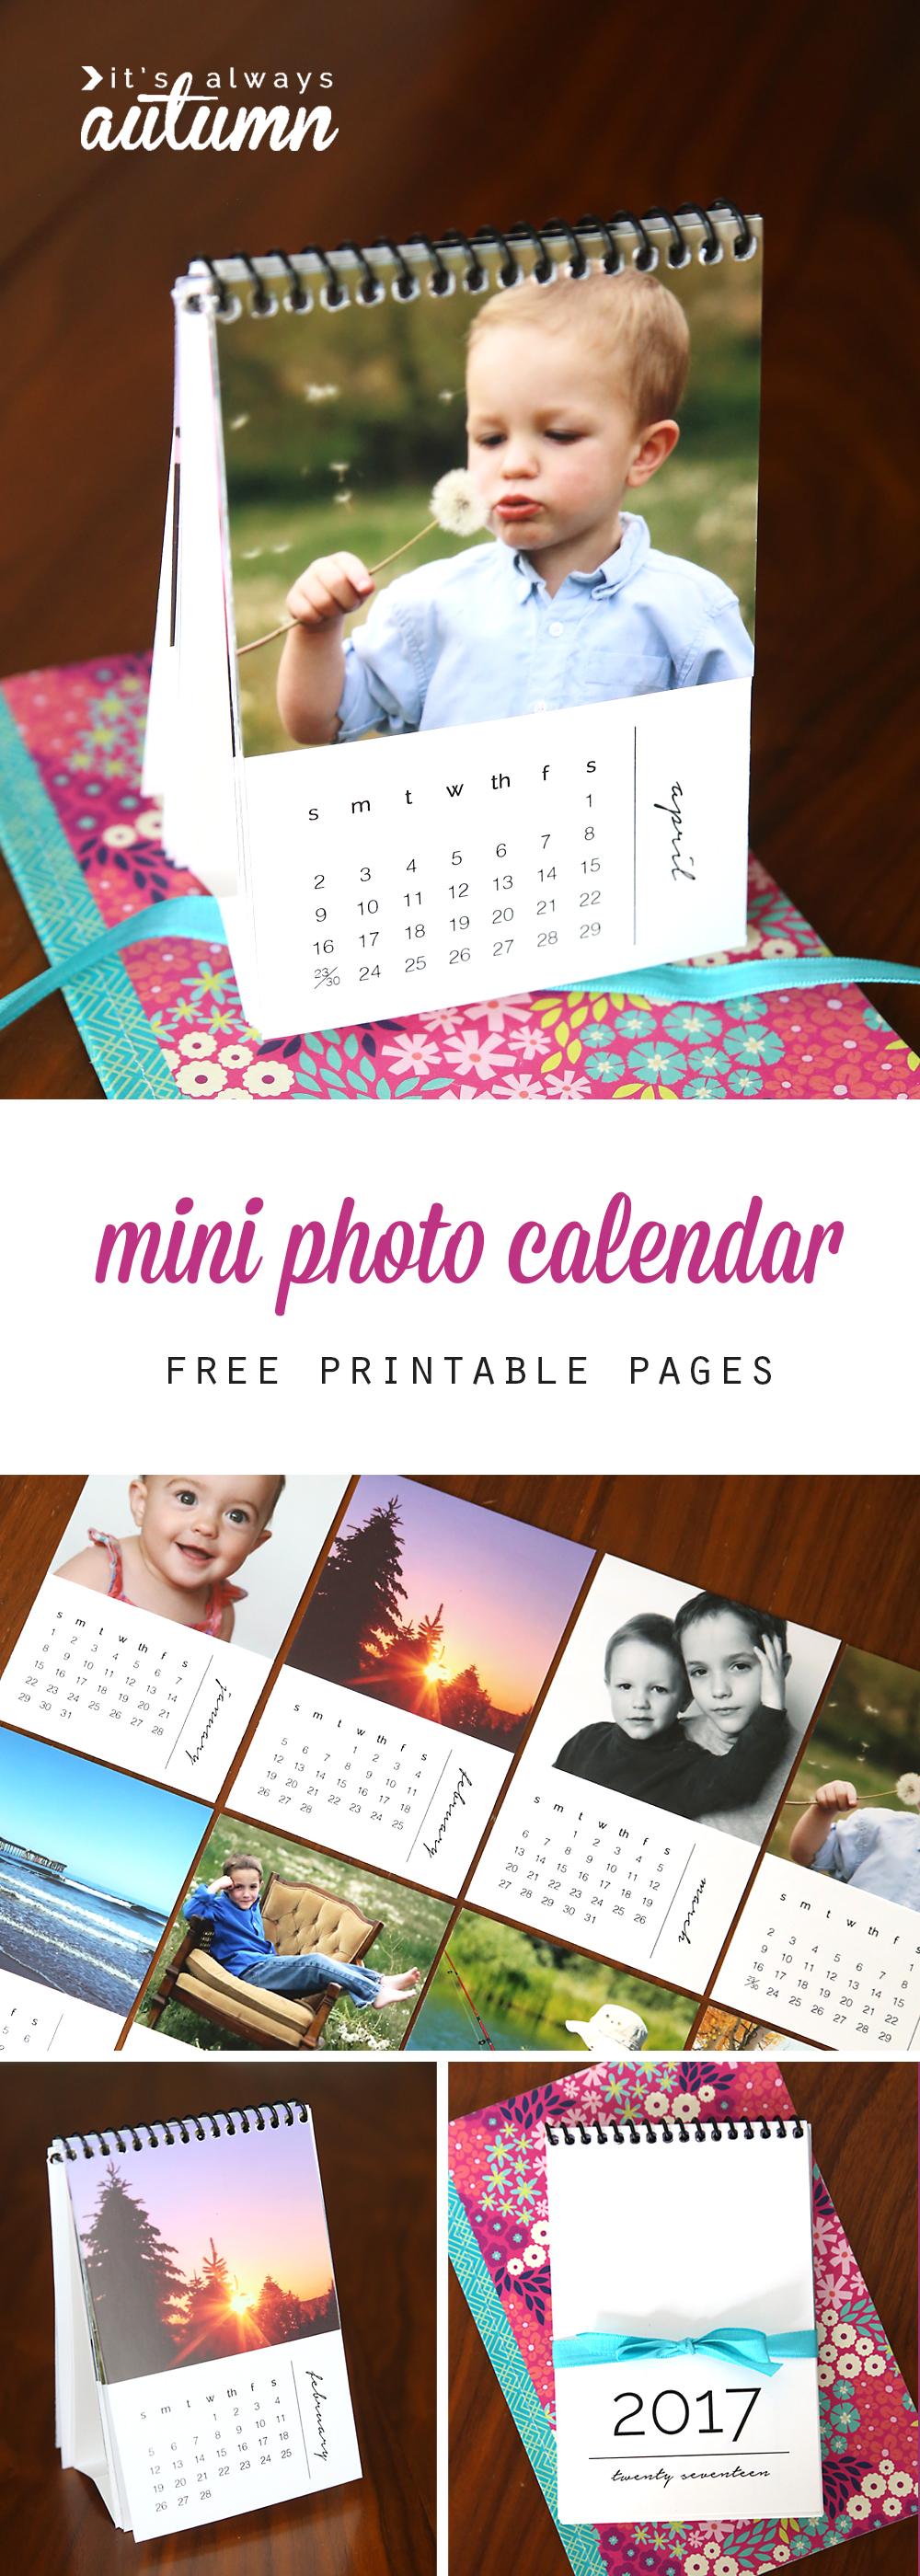 Year Calendar Diy : Diy mini photo calendar w free printables it s always autumn